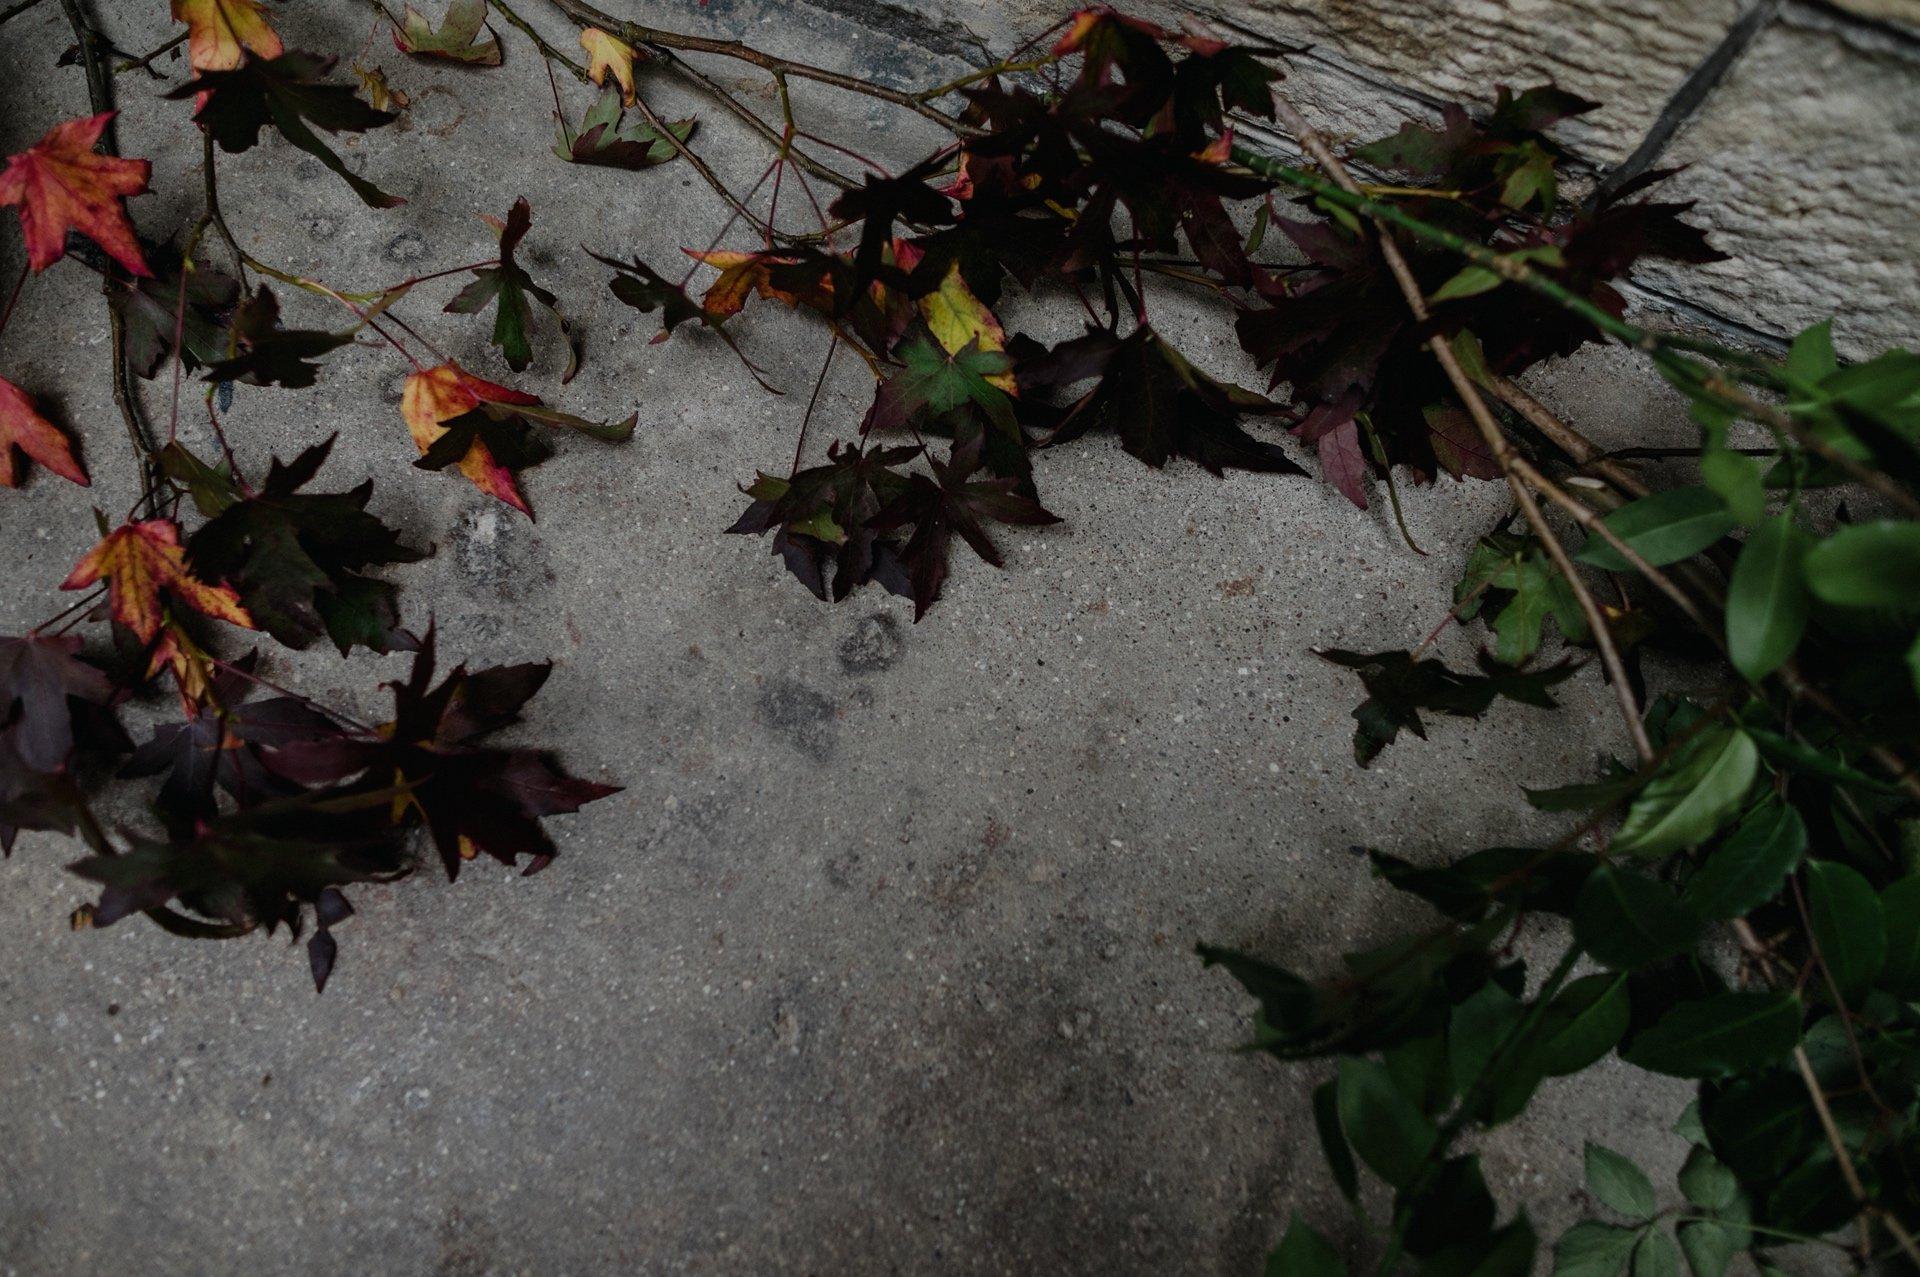 autumn leaves on the concrete floor